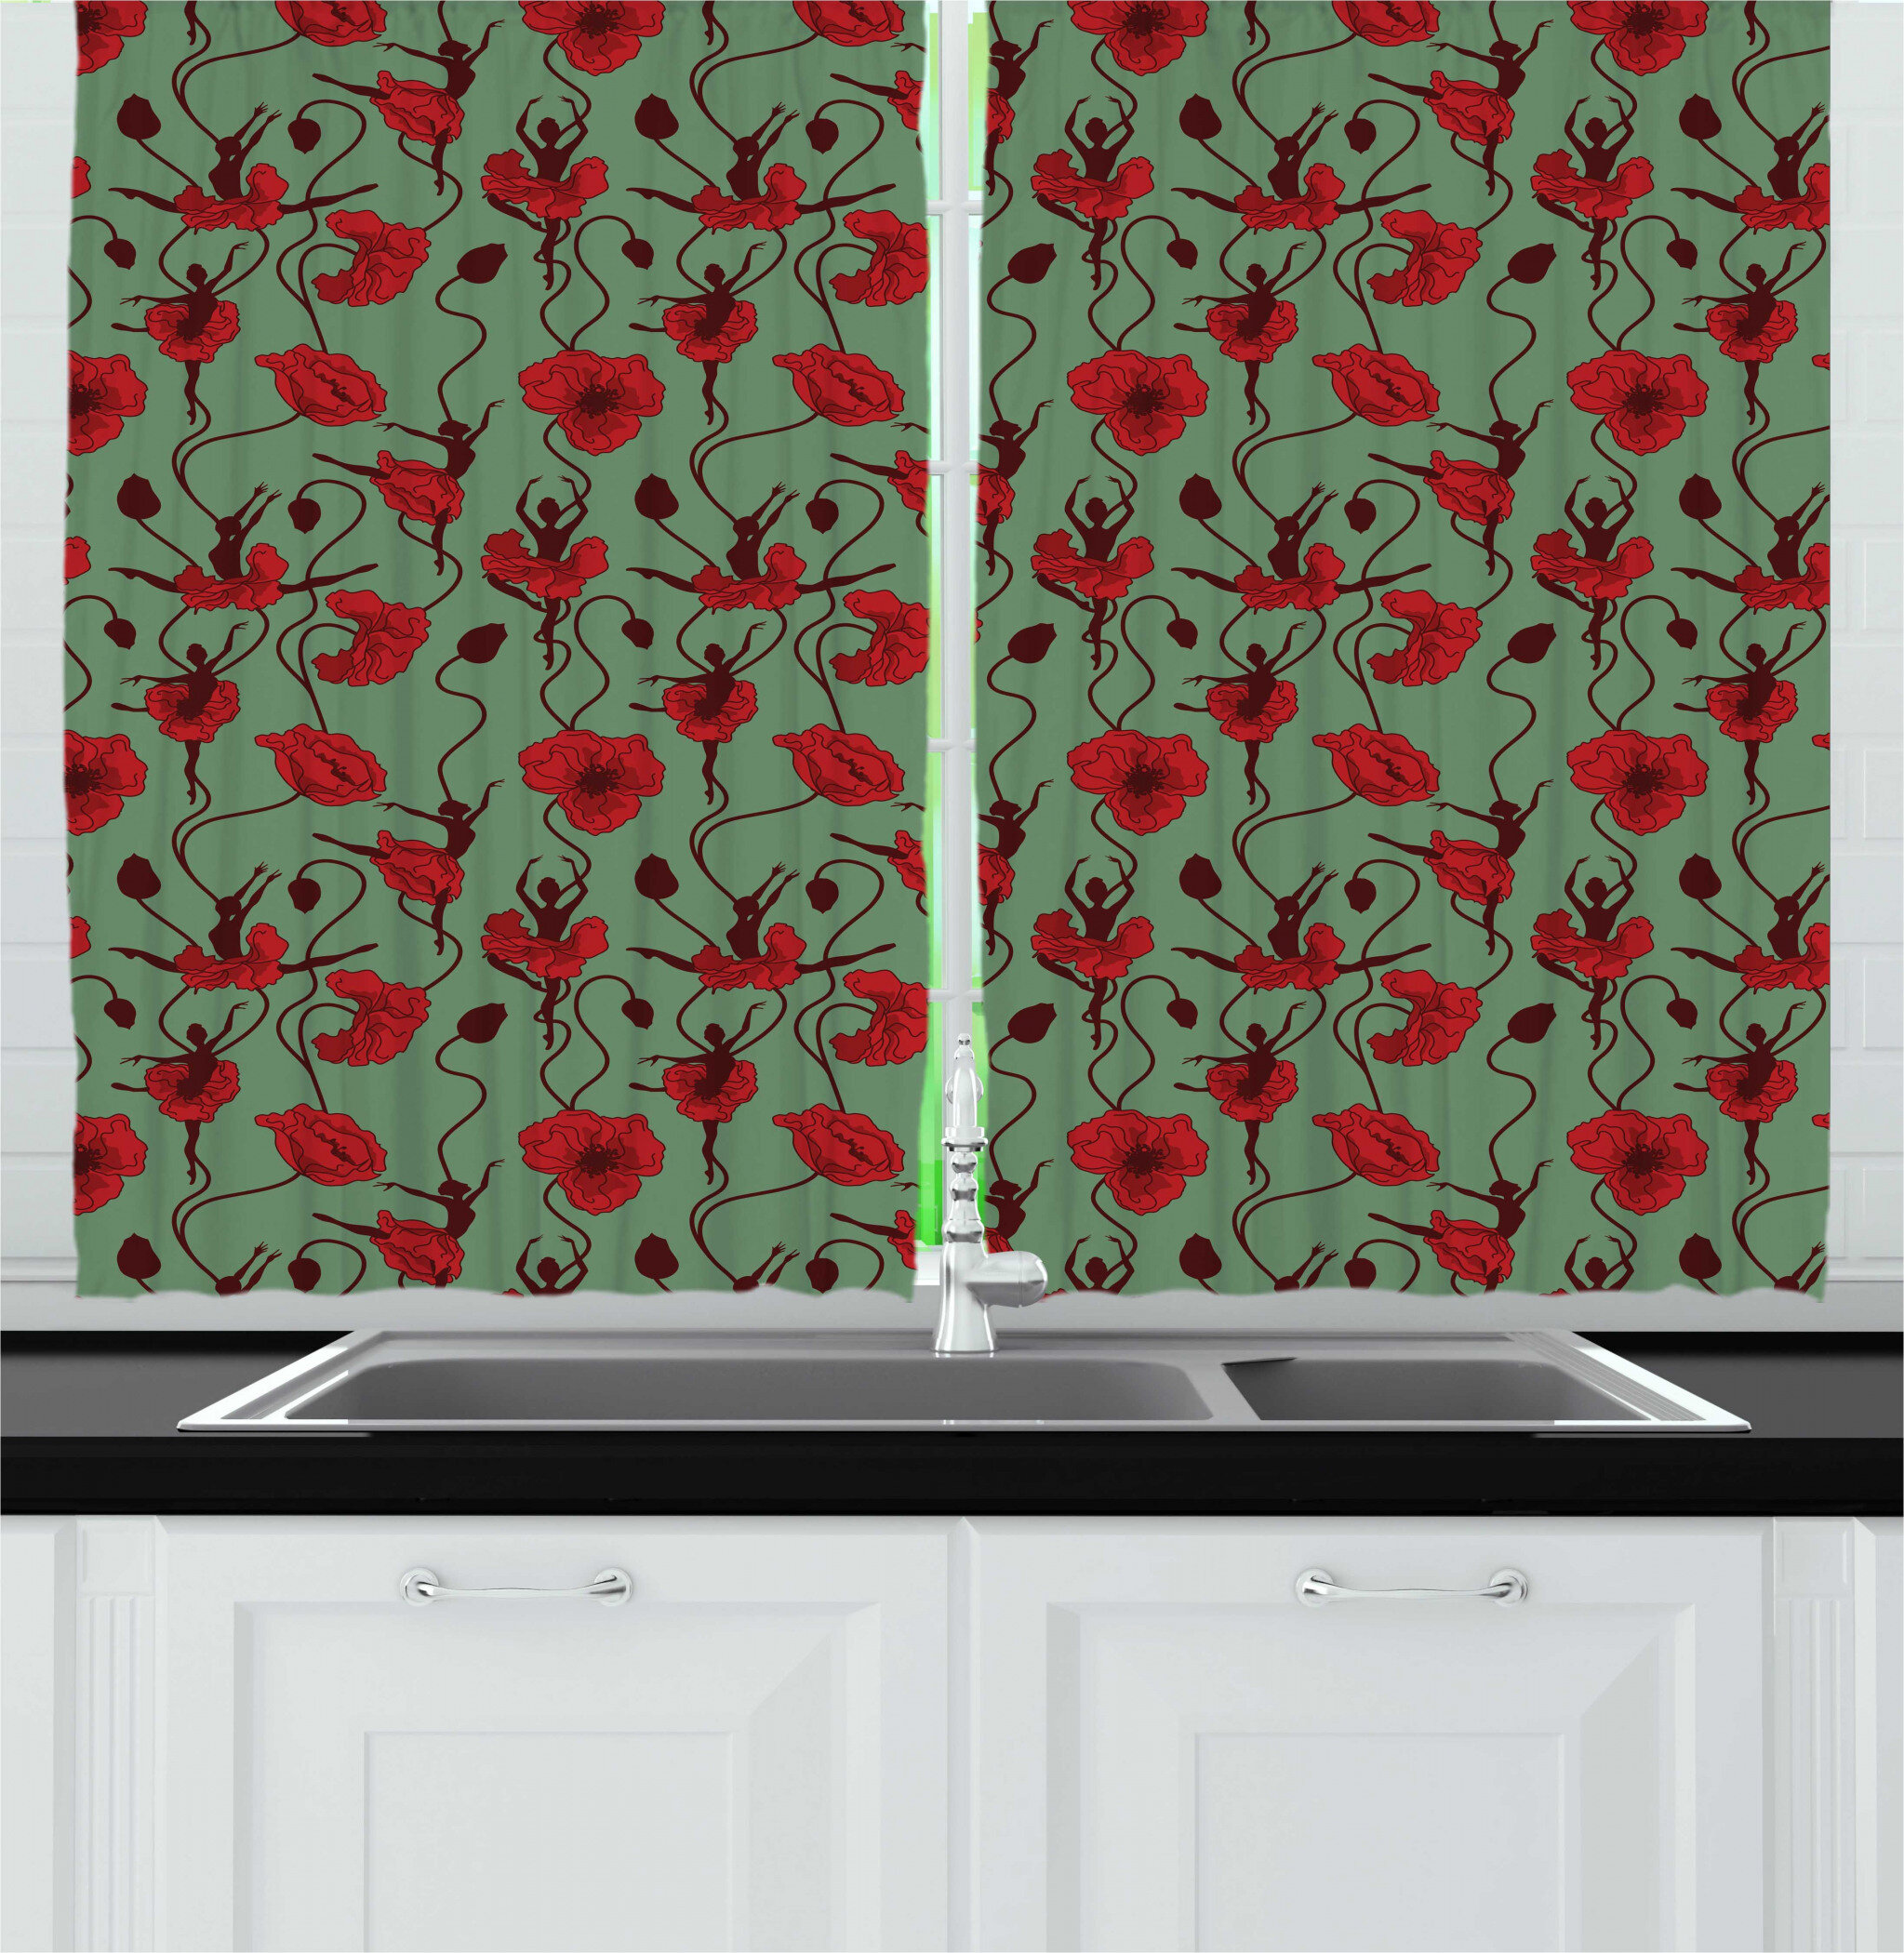 East Urban Home Poppy Kitchen Curtain Wayfair